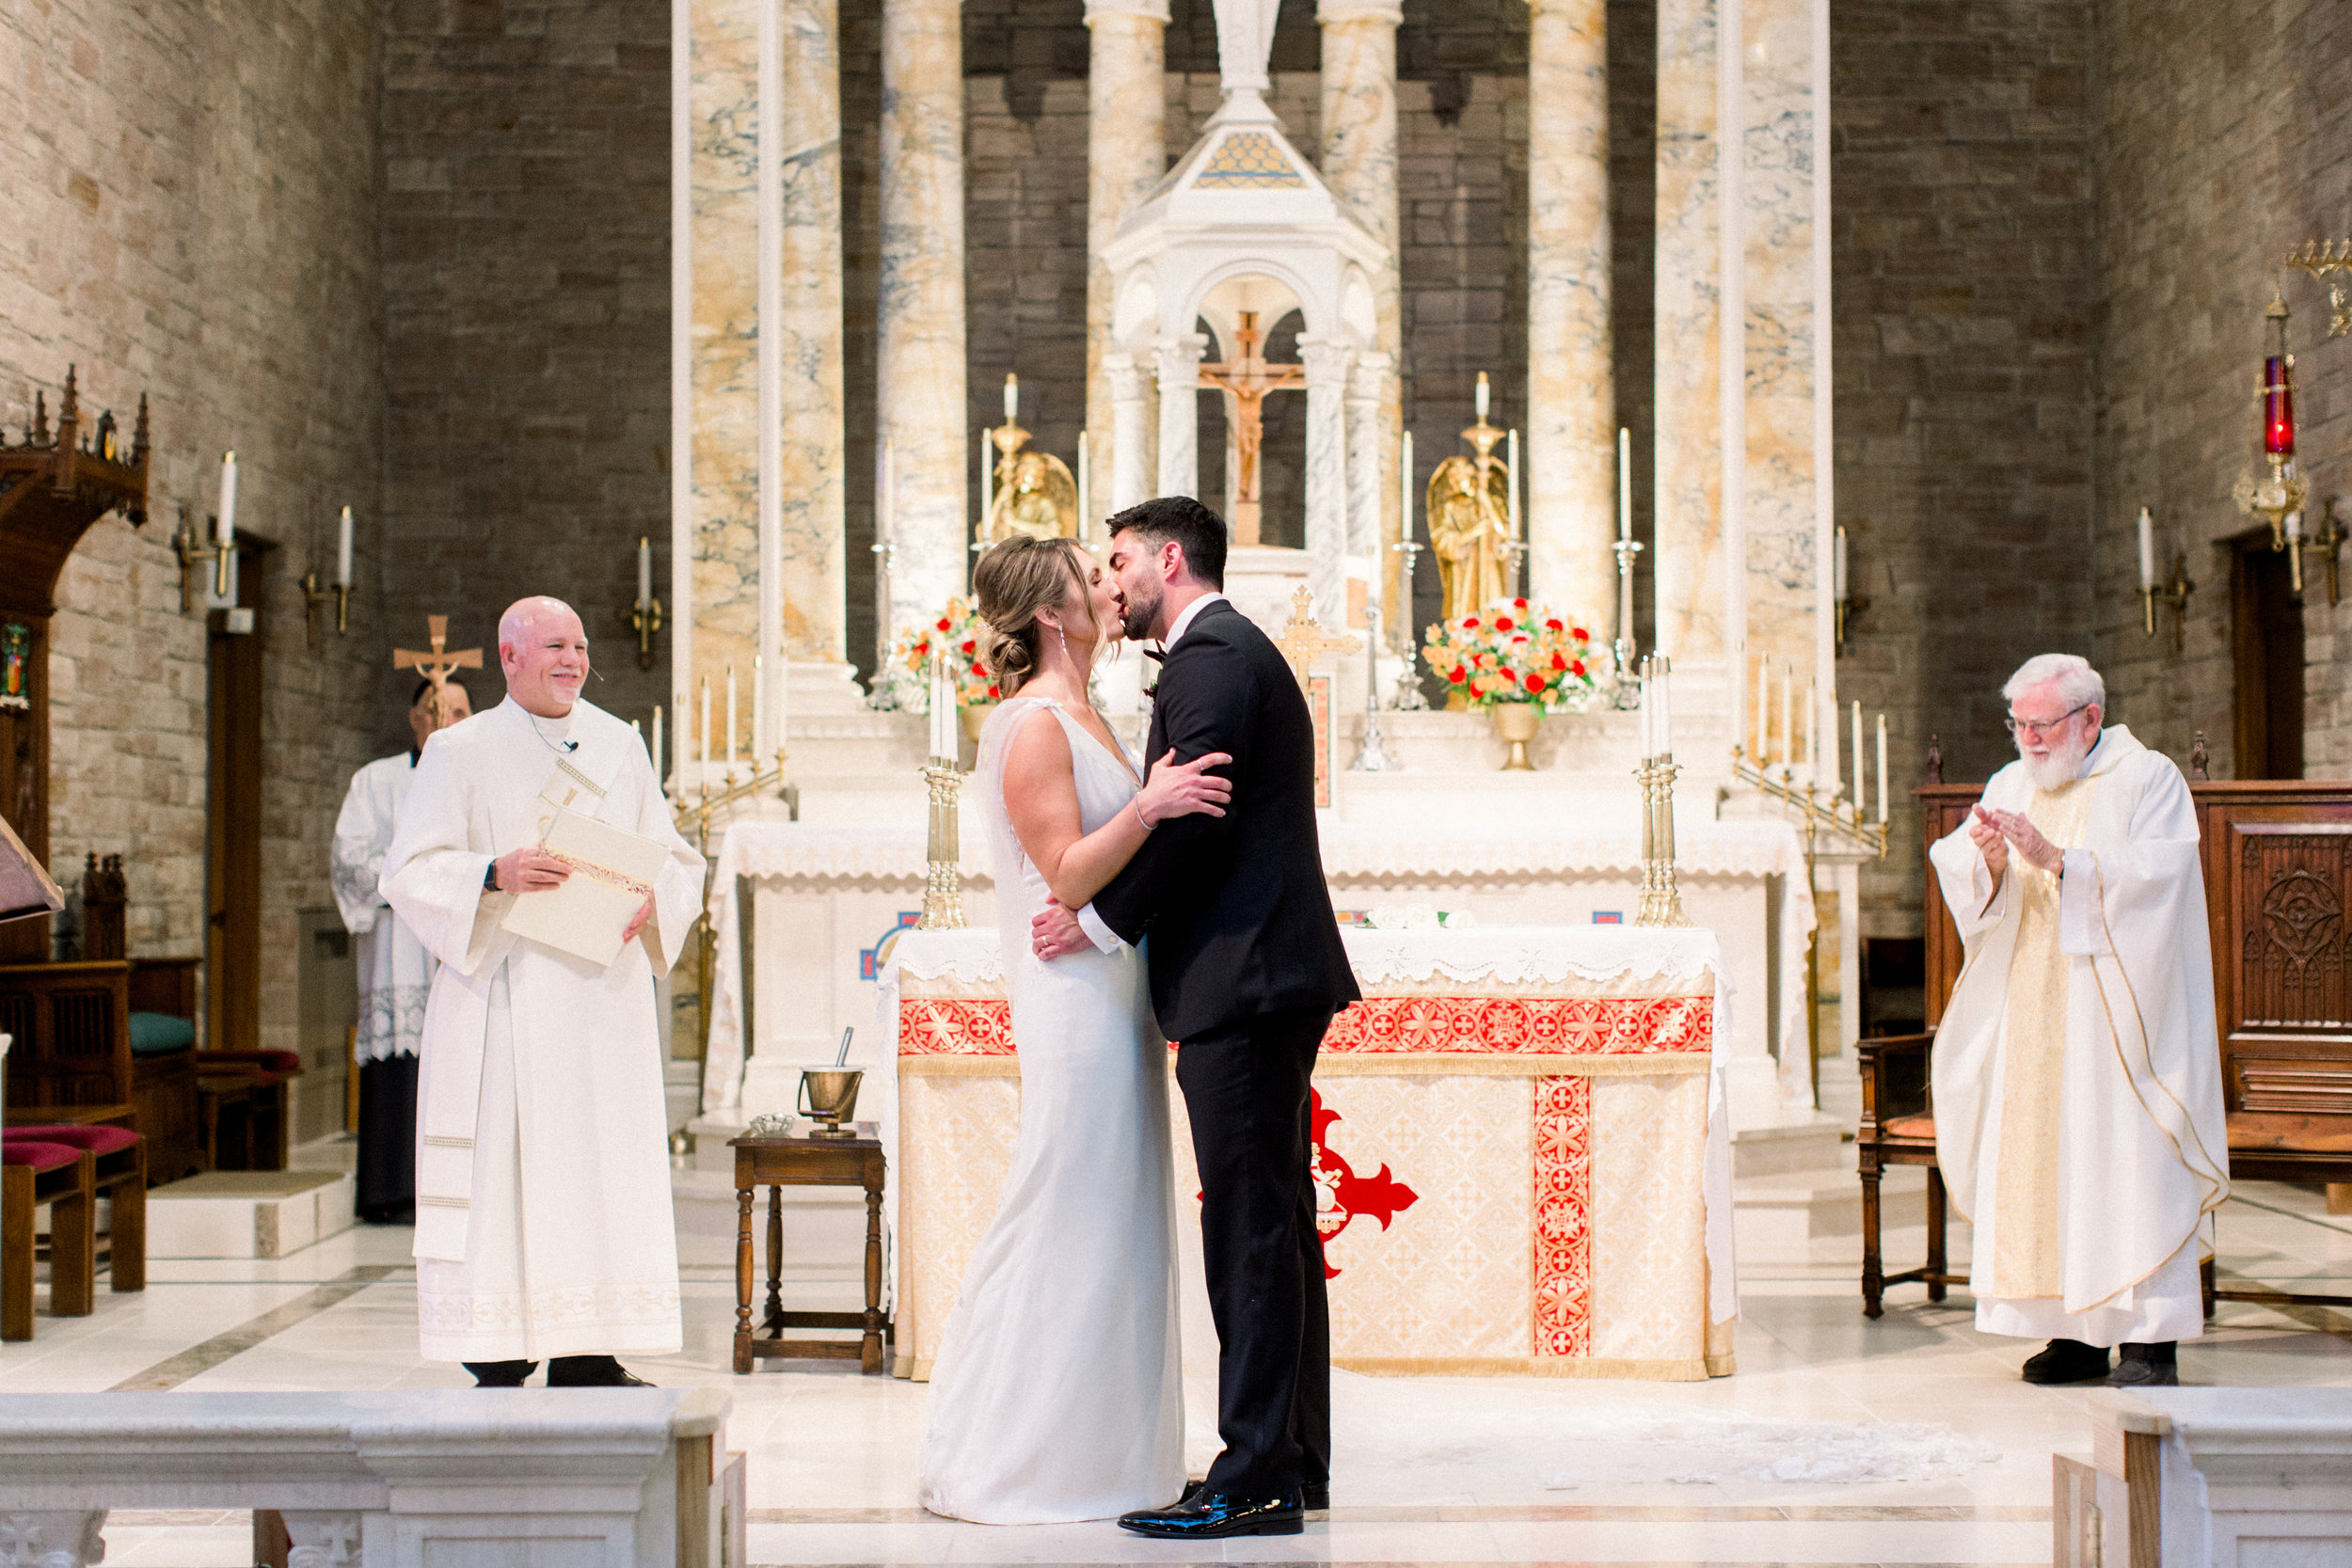 vintners-inn-wedding-in-santa-rosa-california-43.jpg